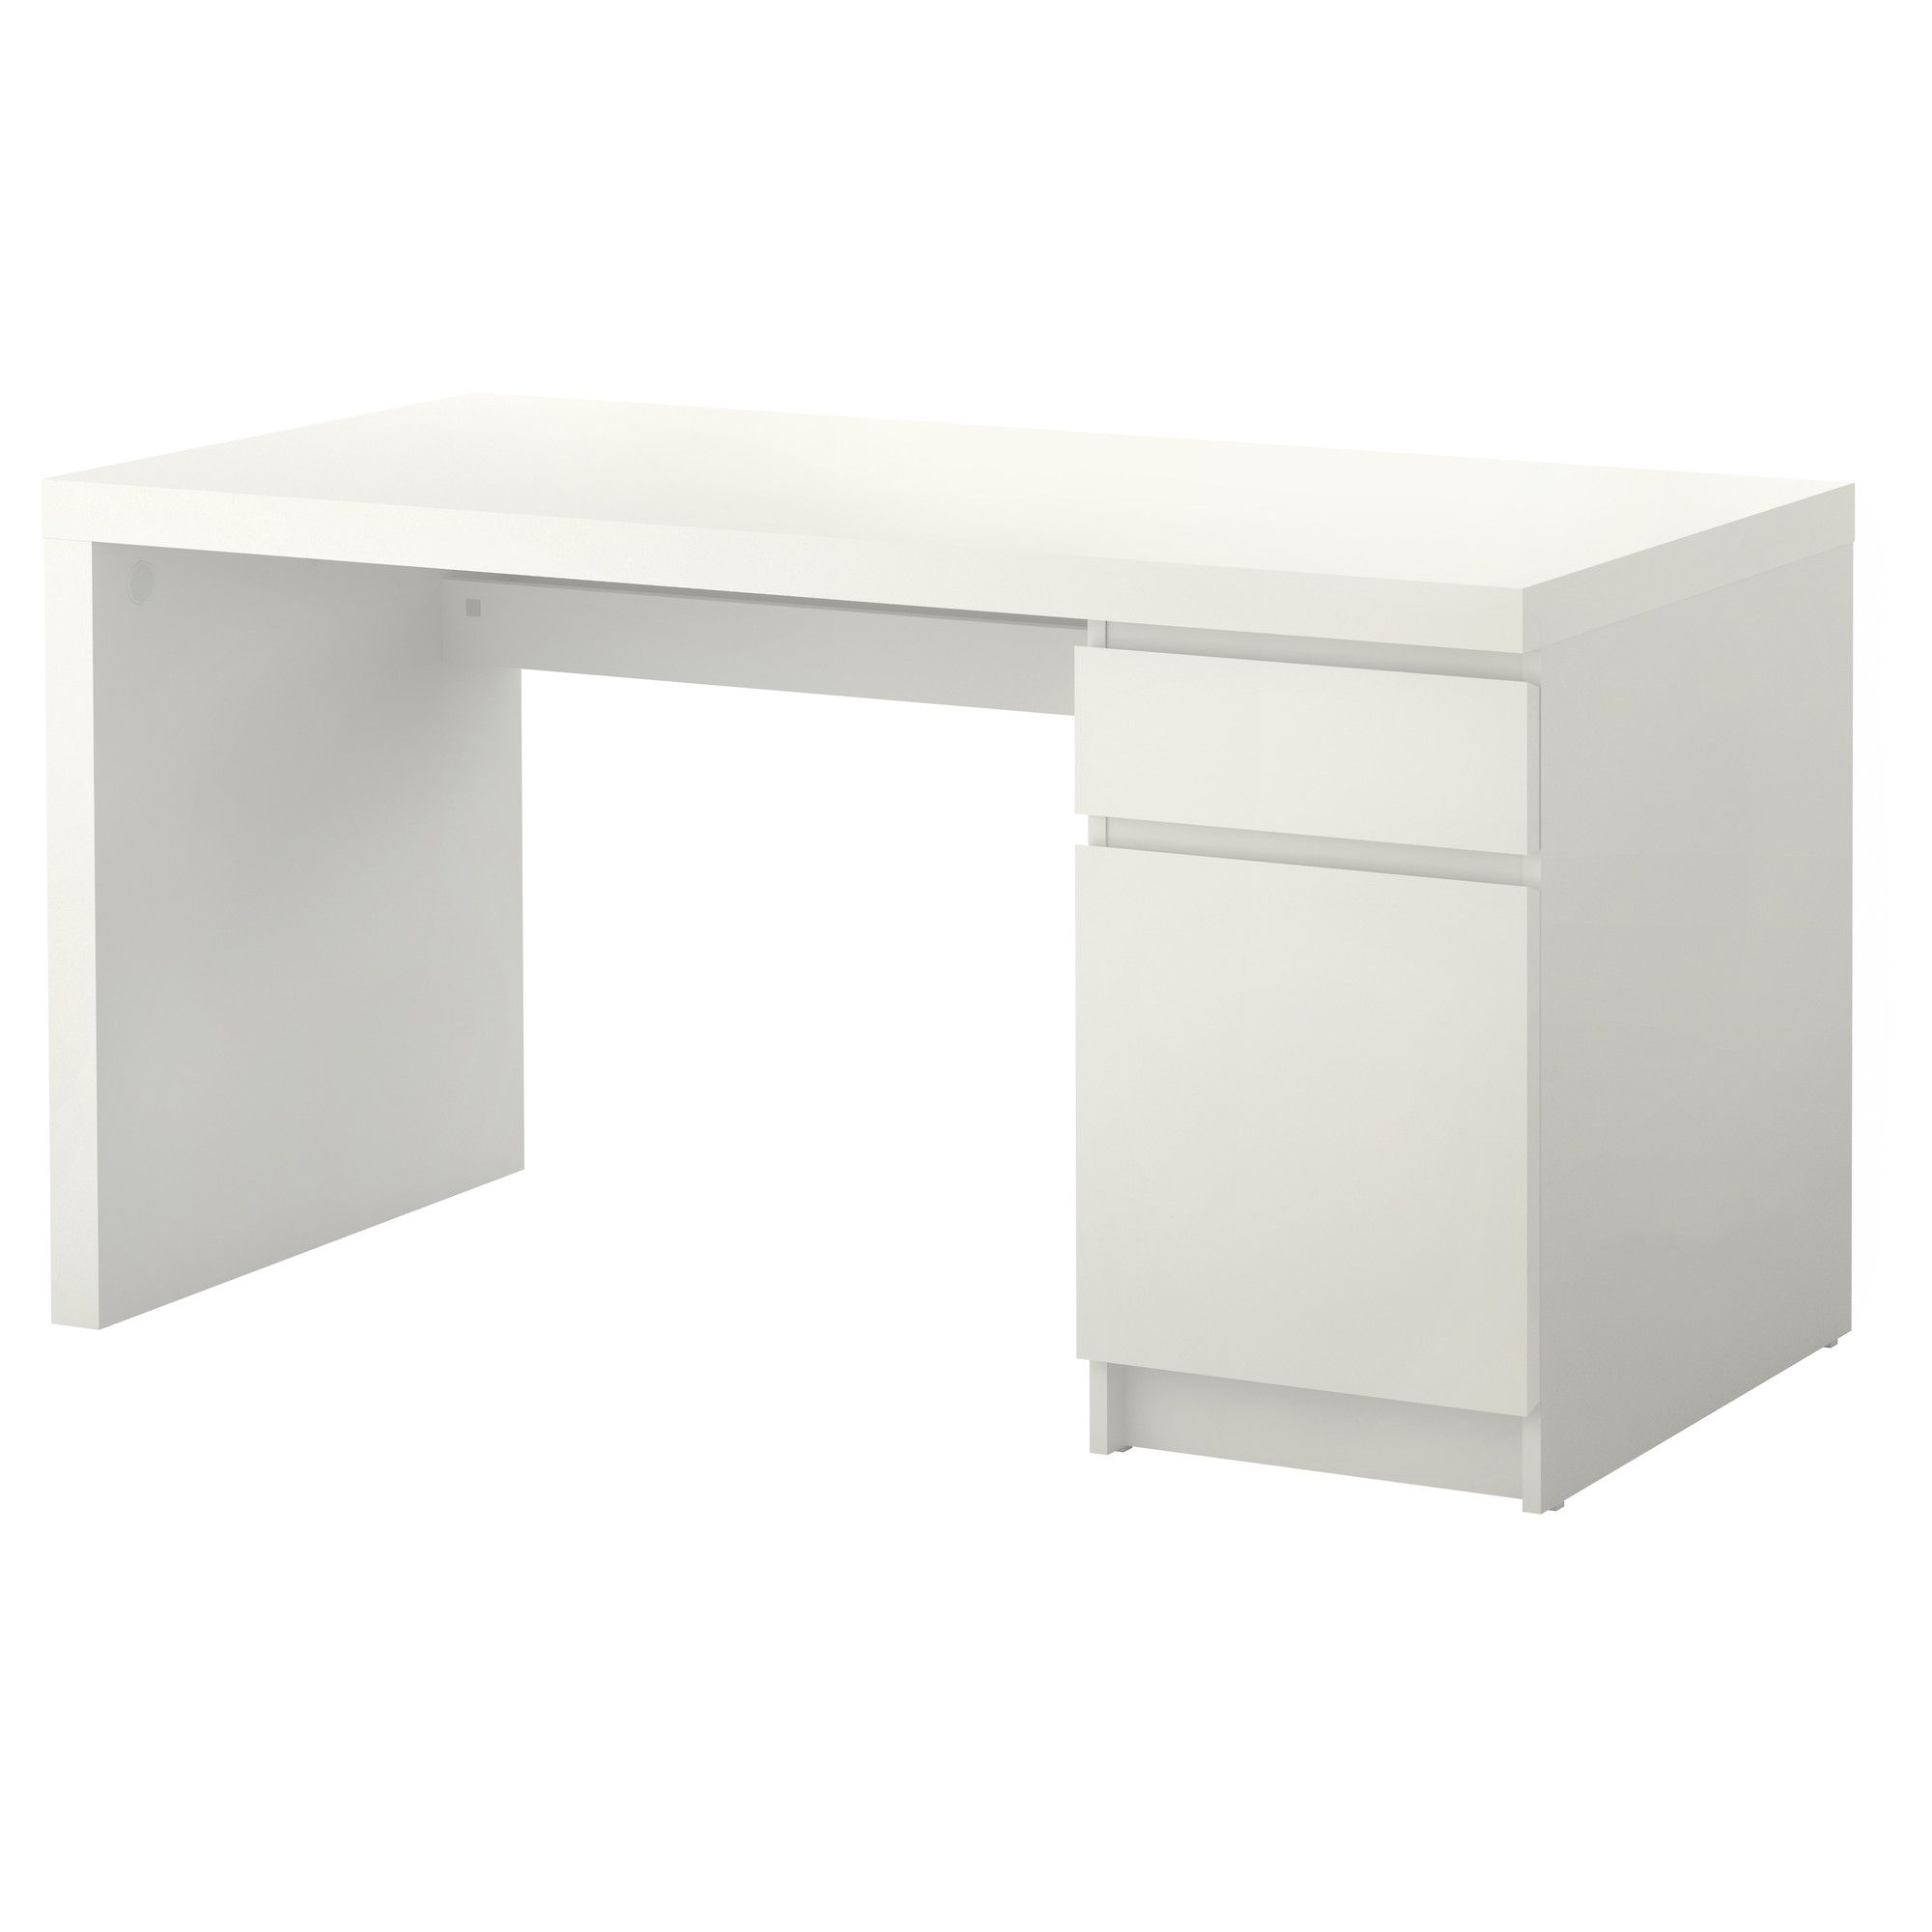 Malm Desk White 55 1 8x25 5 8 Mesa Branca Reforma De Escrivaninha Mesa De Quarto